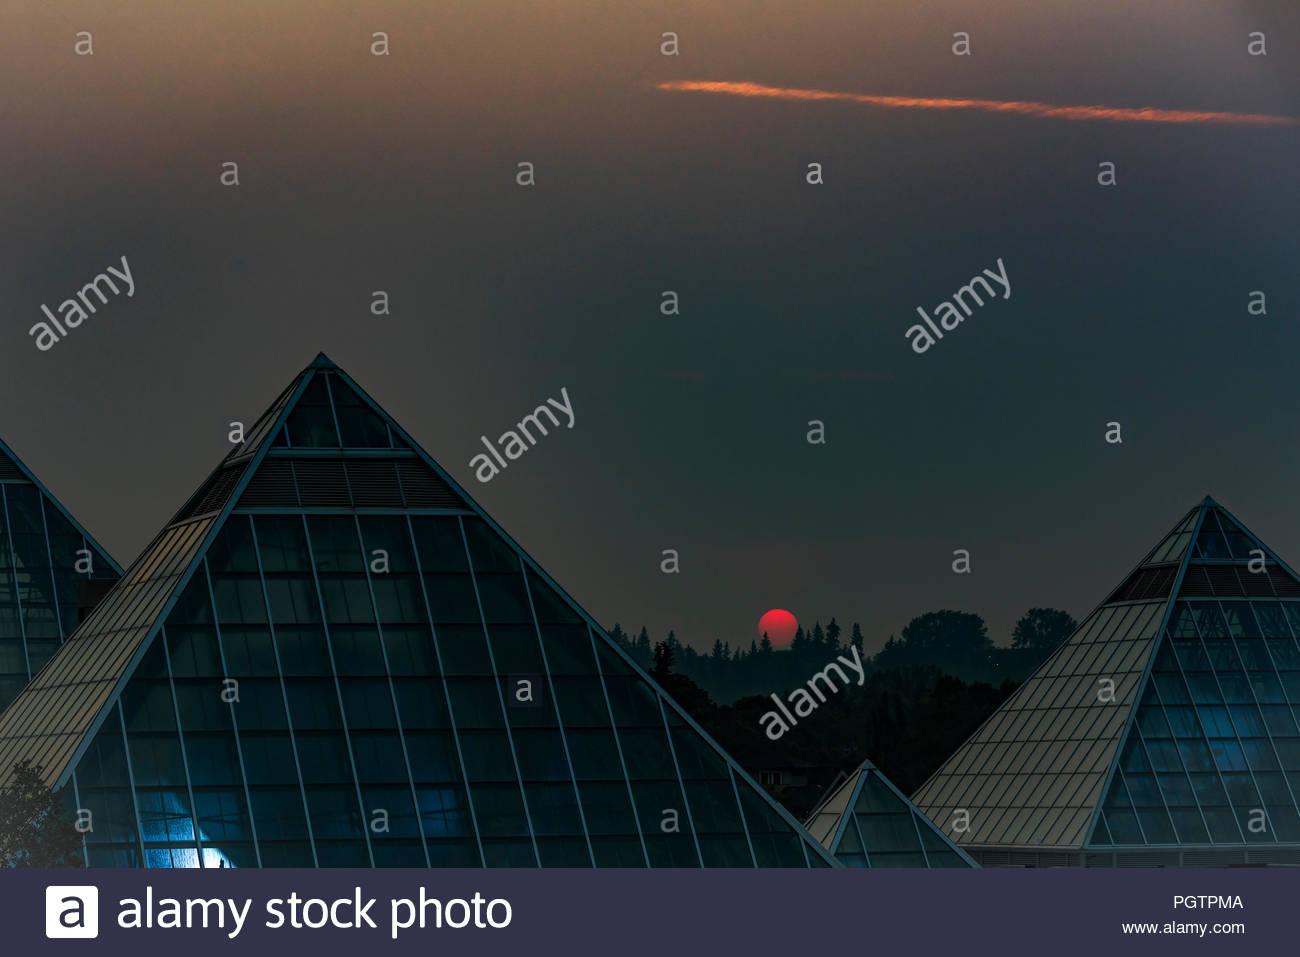 Sun rises through smoke filled sky, Muttart Conservatory Pyramids, Edmonton, Alberta, Canada. - Stock Image